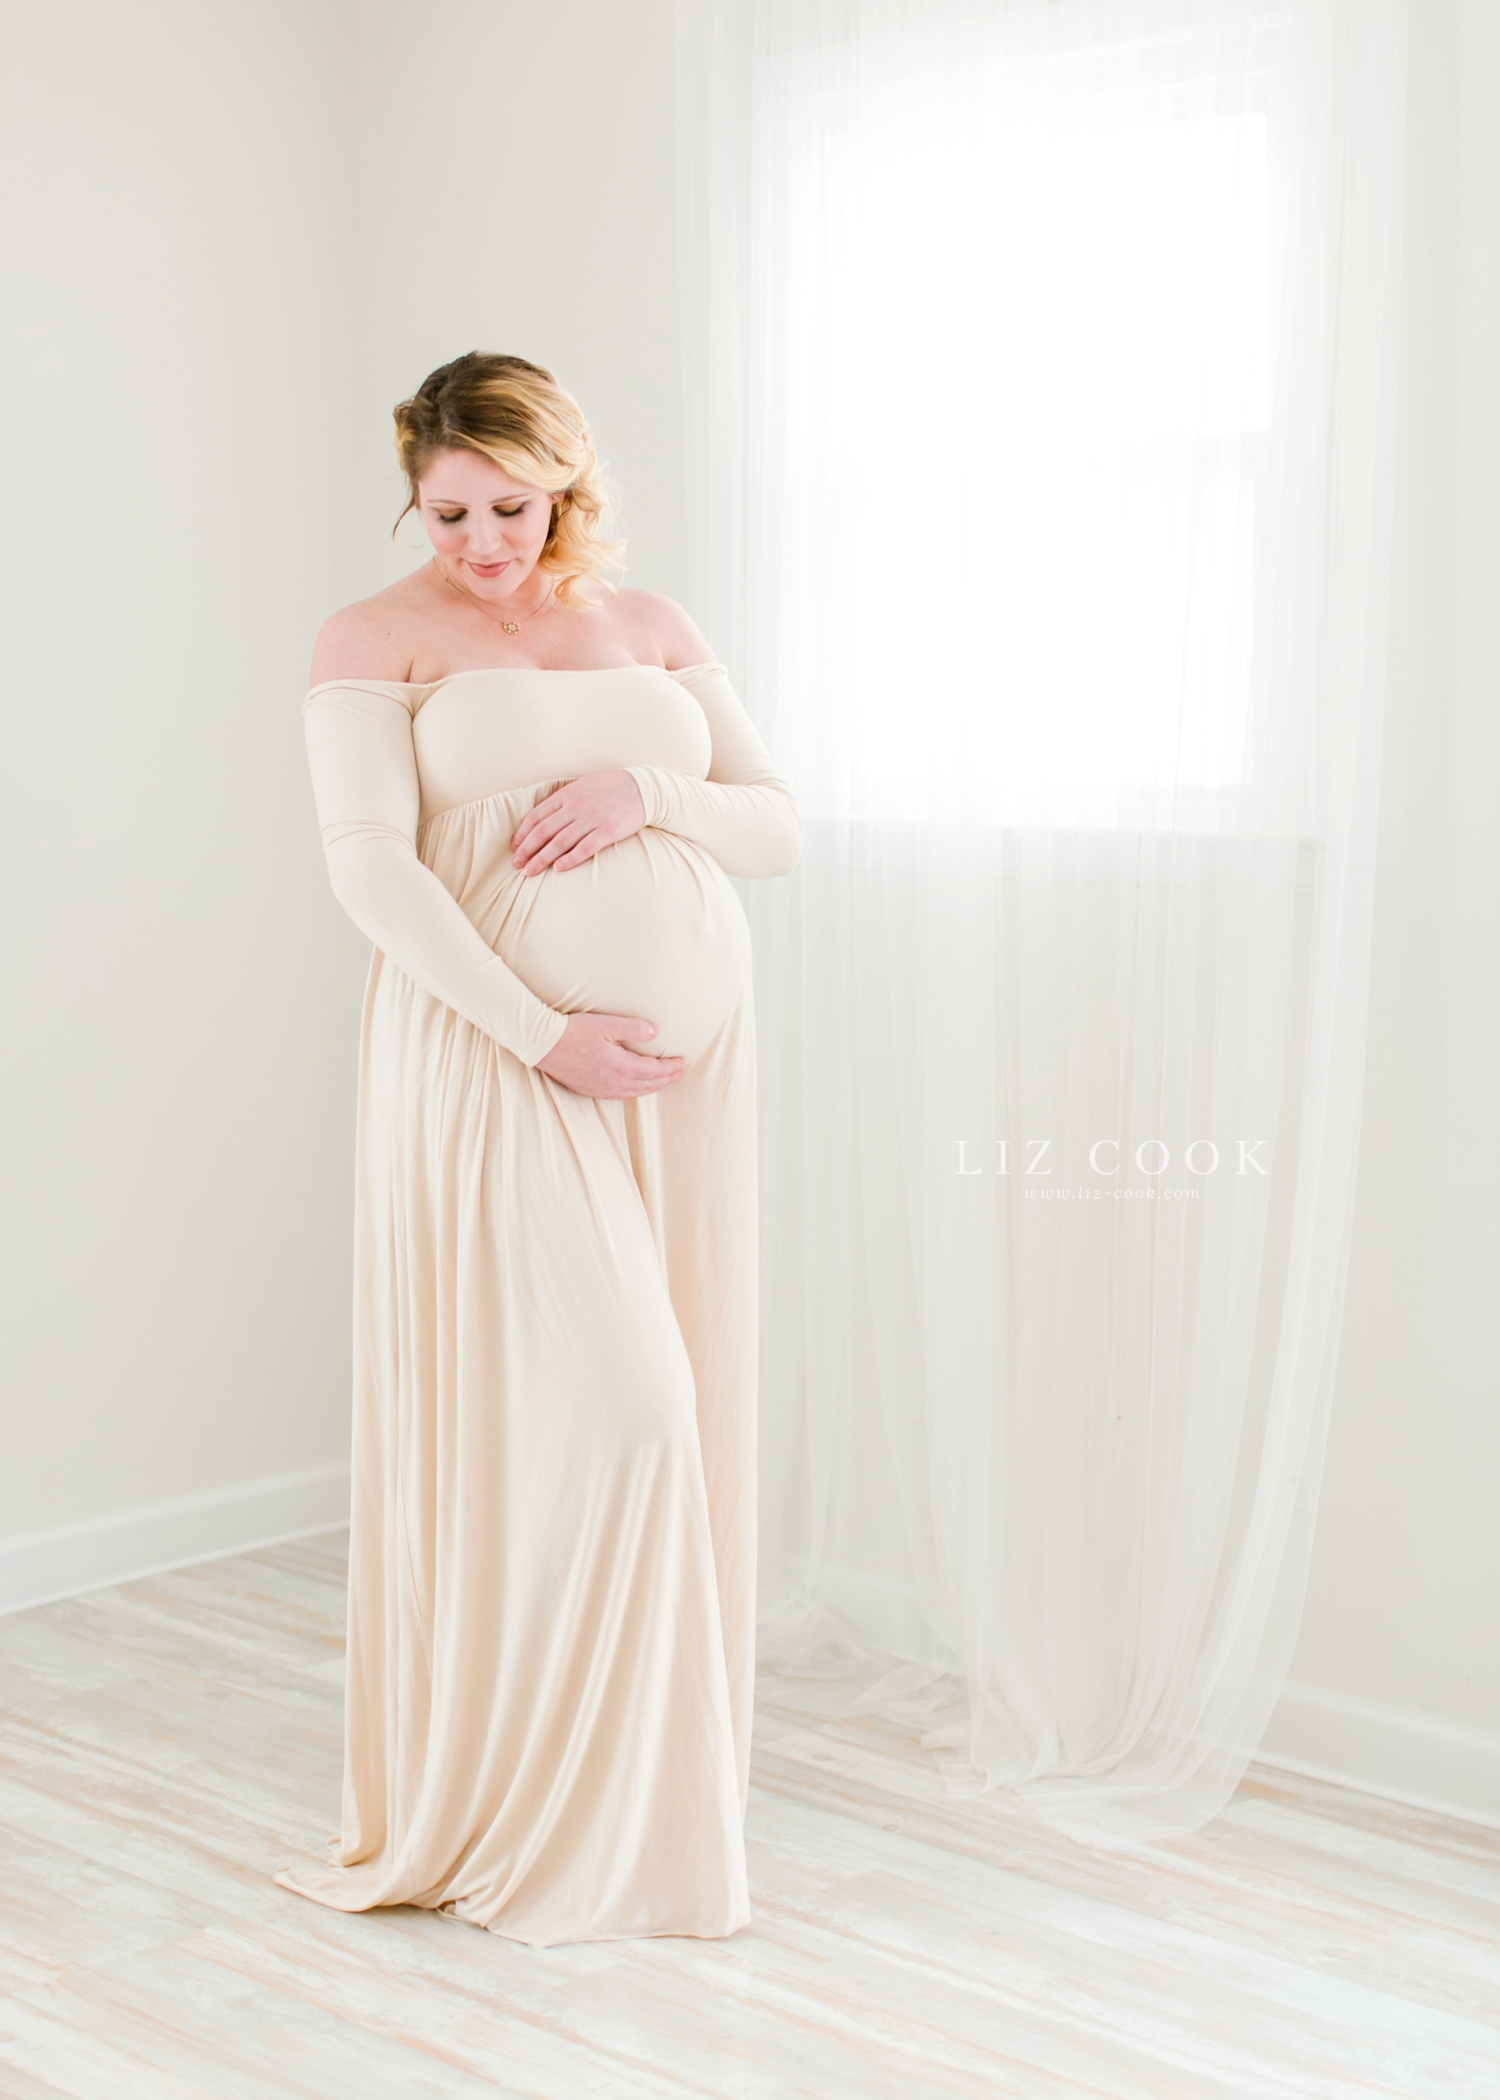 lynchburg_maternity_photographer_0006.jpg